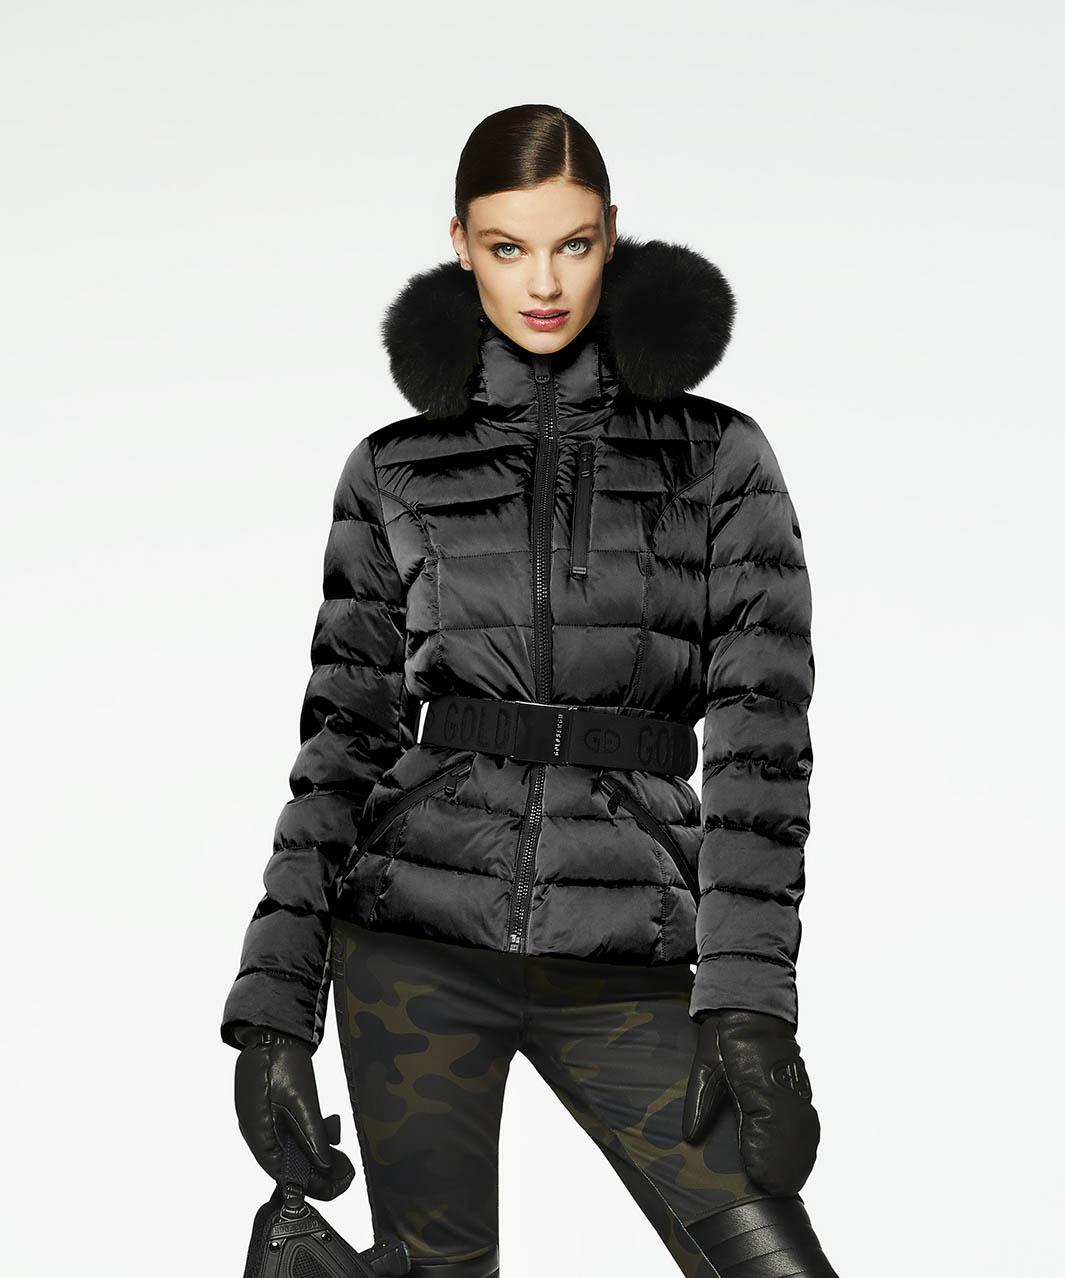 Women's Soldis Ski Jacket